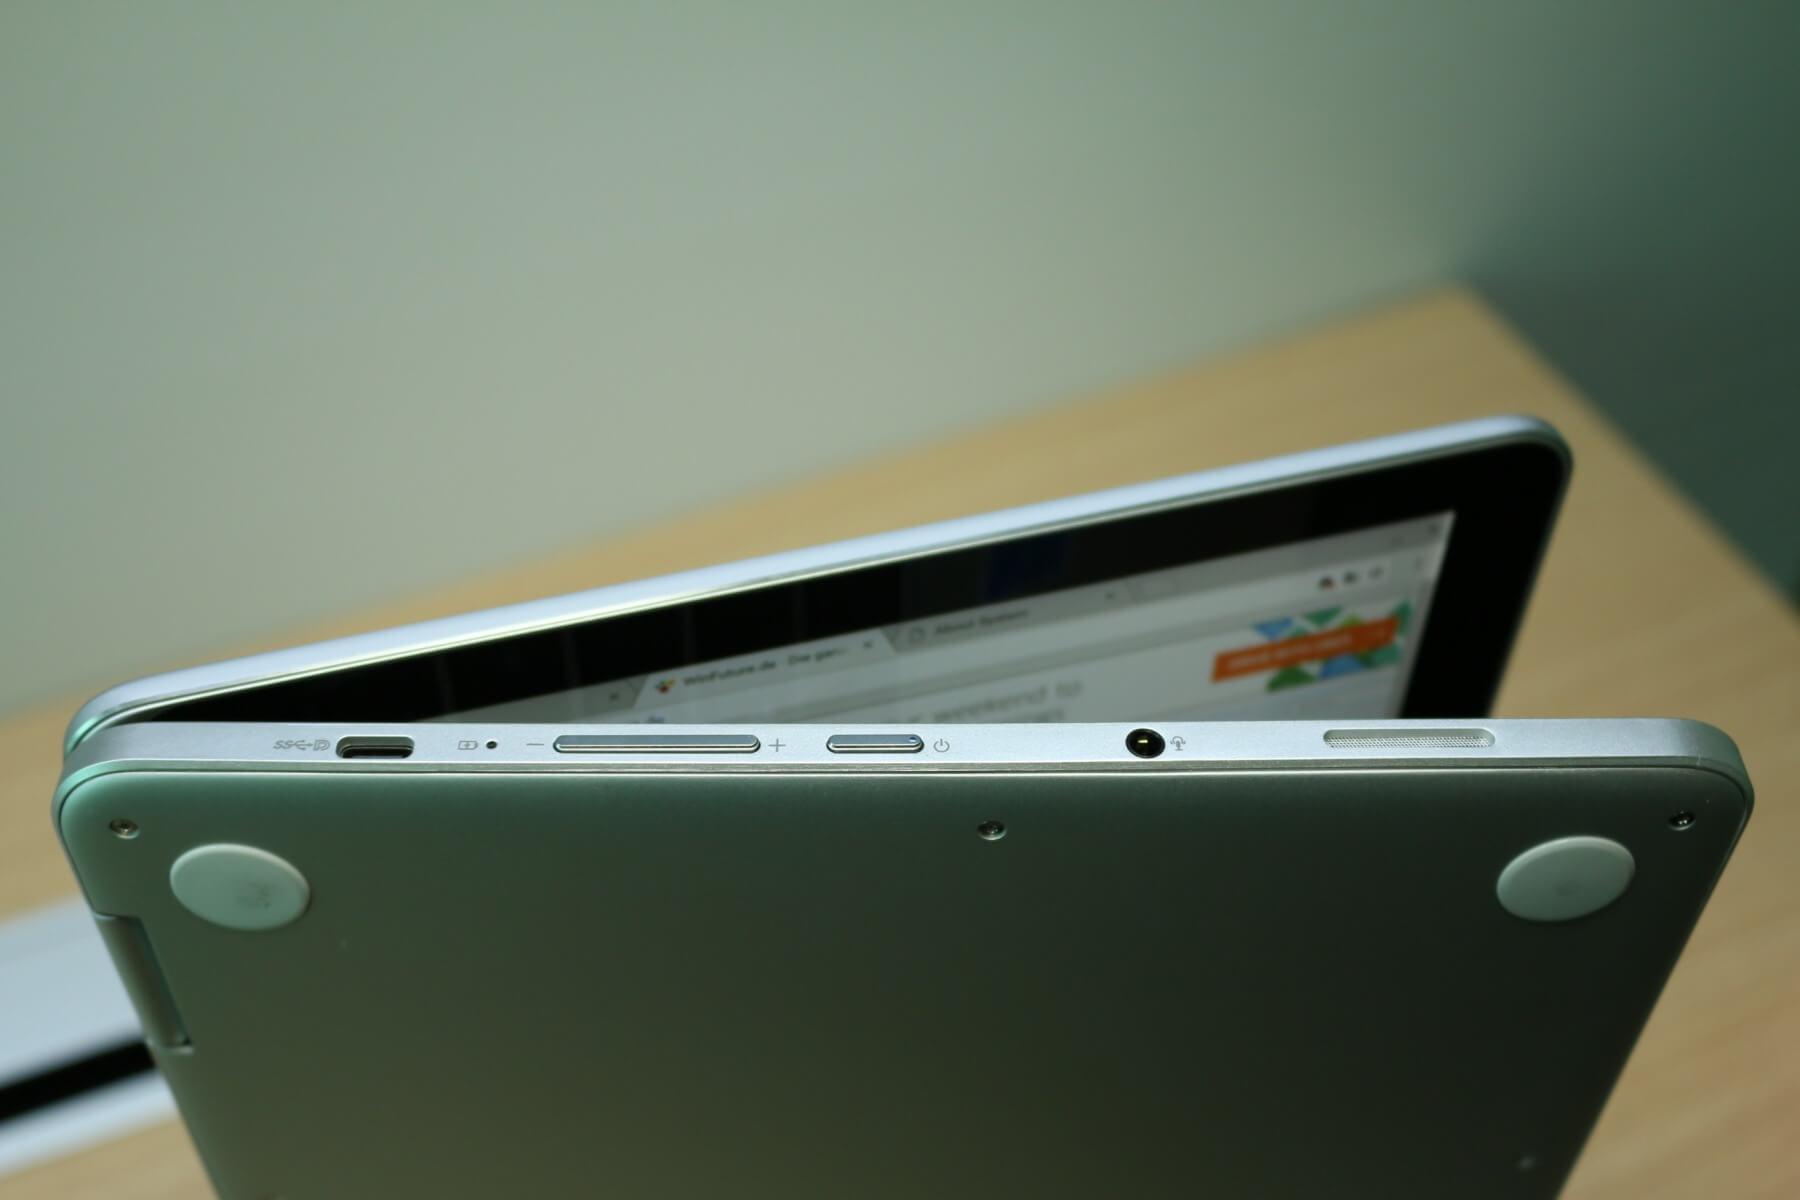 ASUS Chromebook Flip C302: Edles Chrome-OS-Convertible